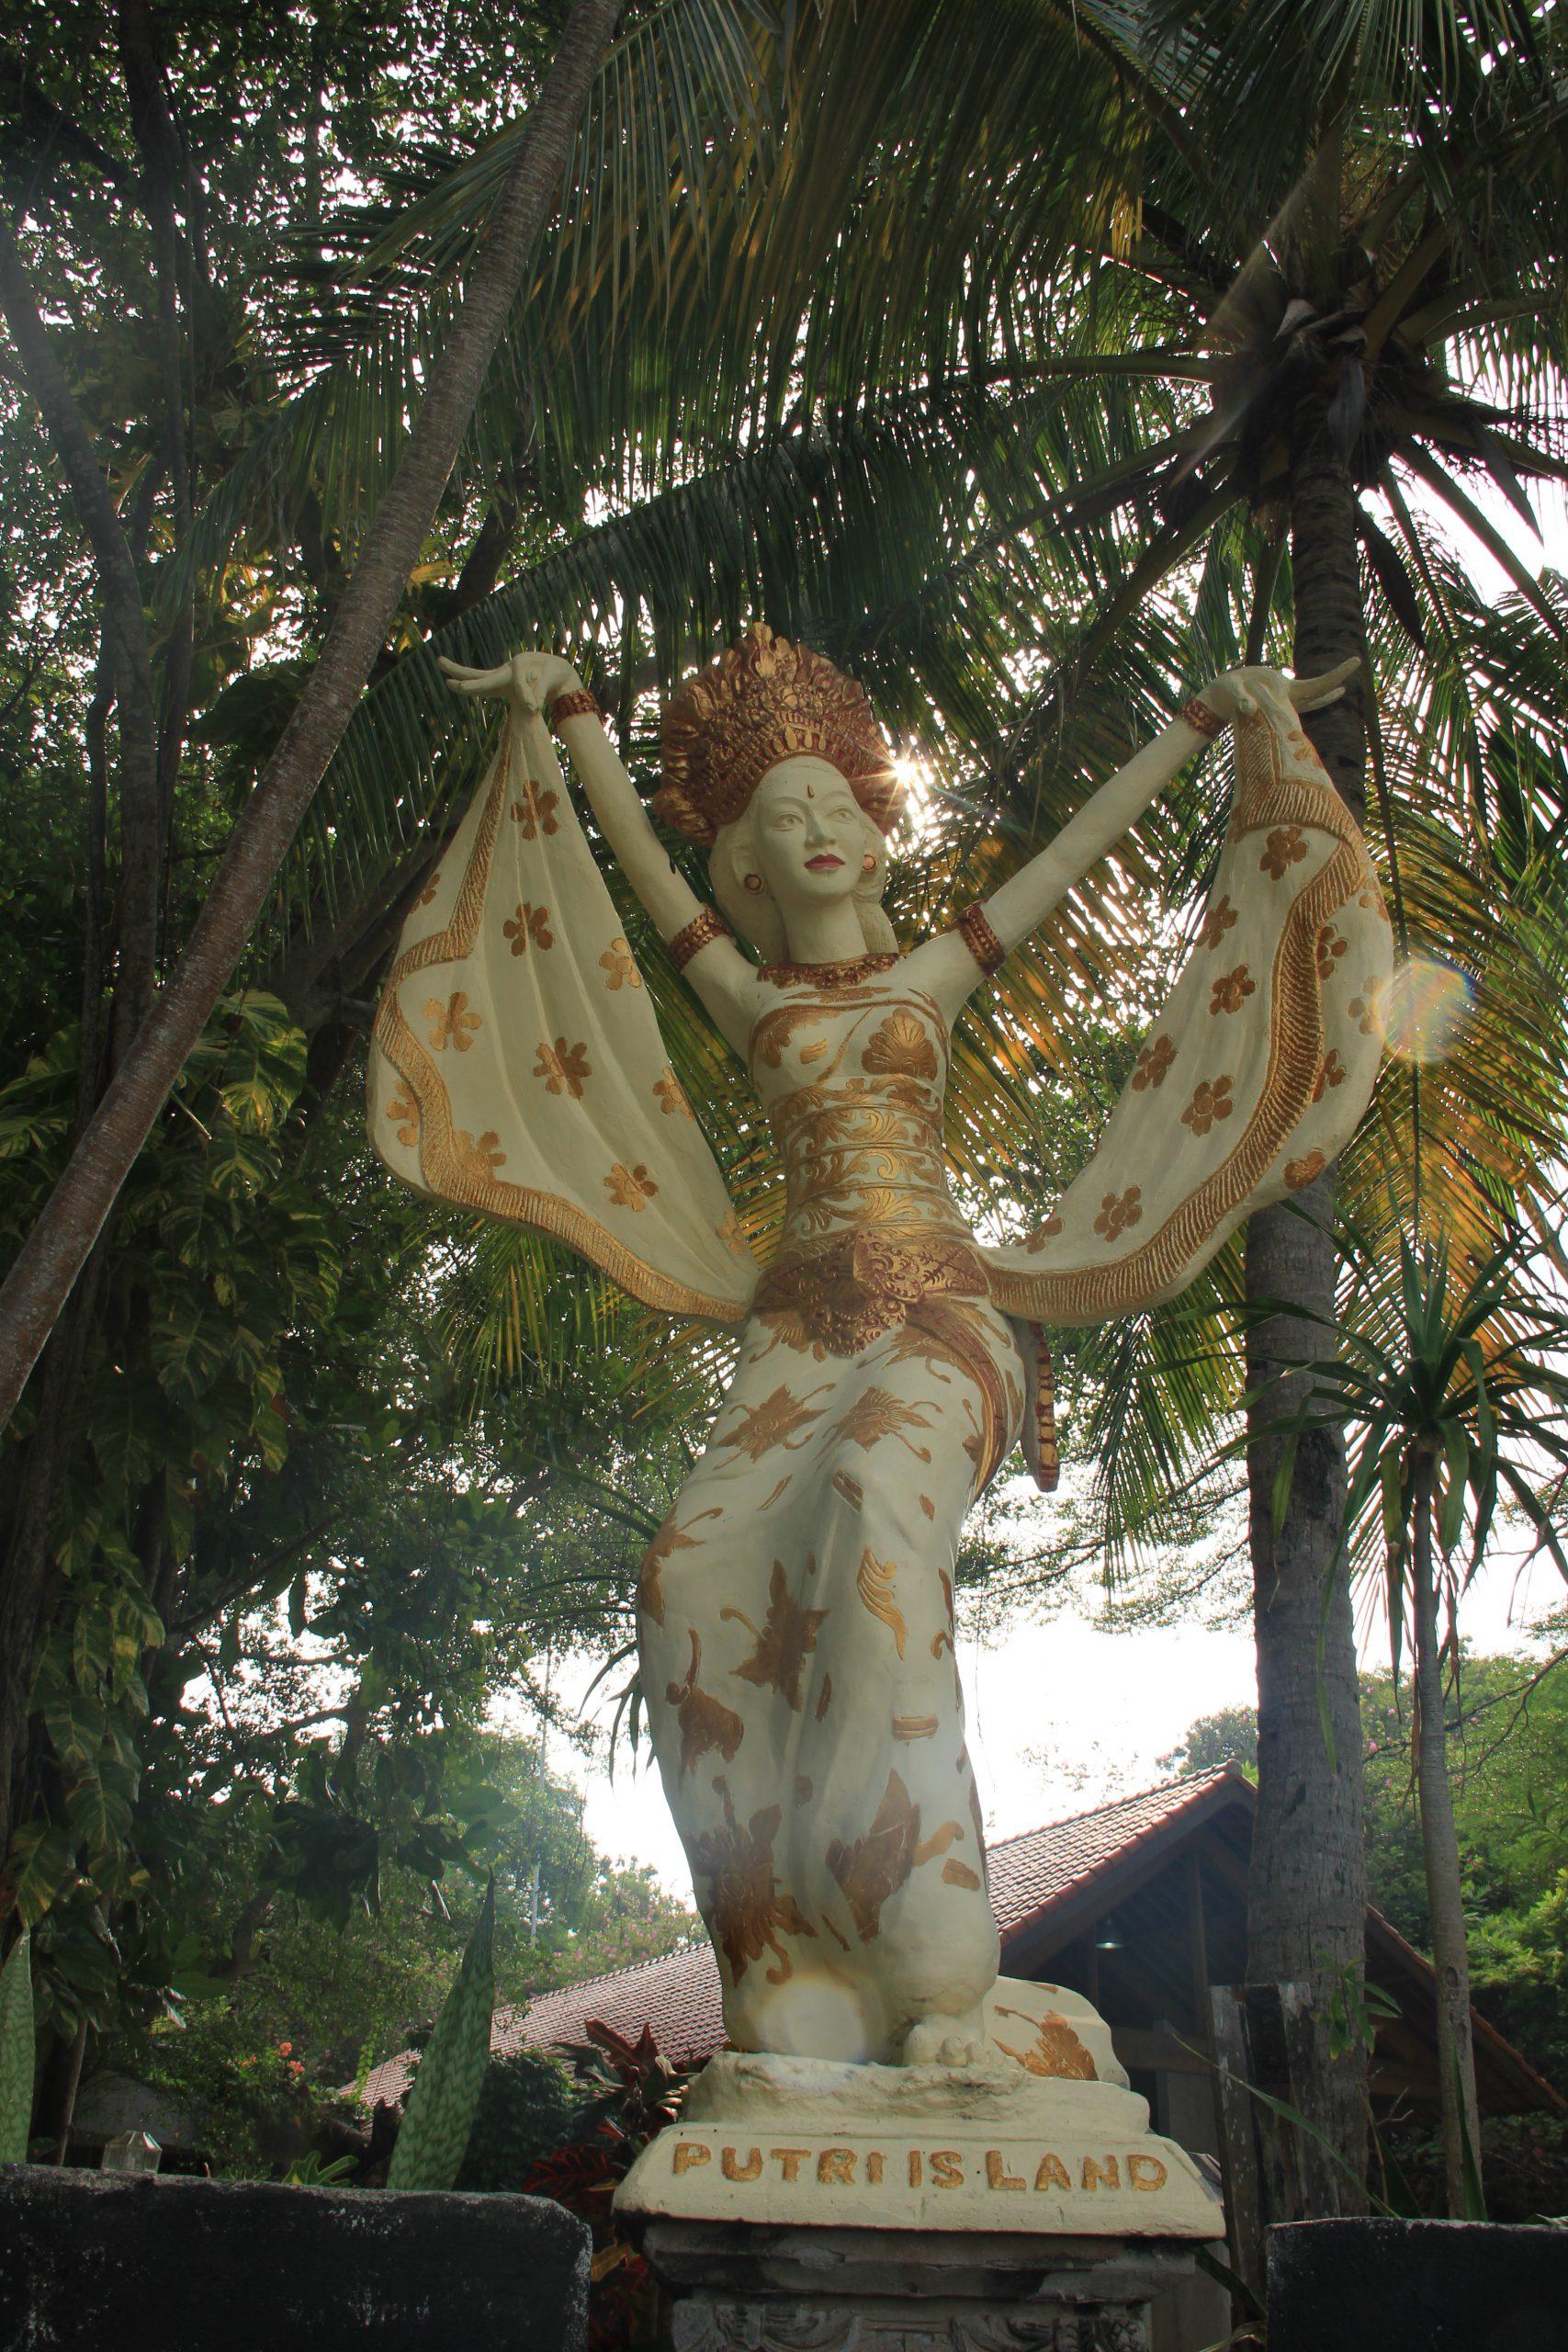 Patung Putri yang berada di salah satu sudut sengaja dibuat untuk menjadi simbol Pulau Putri